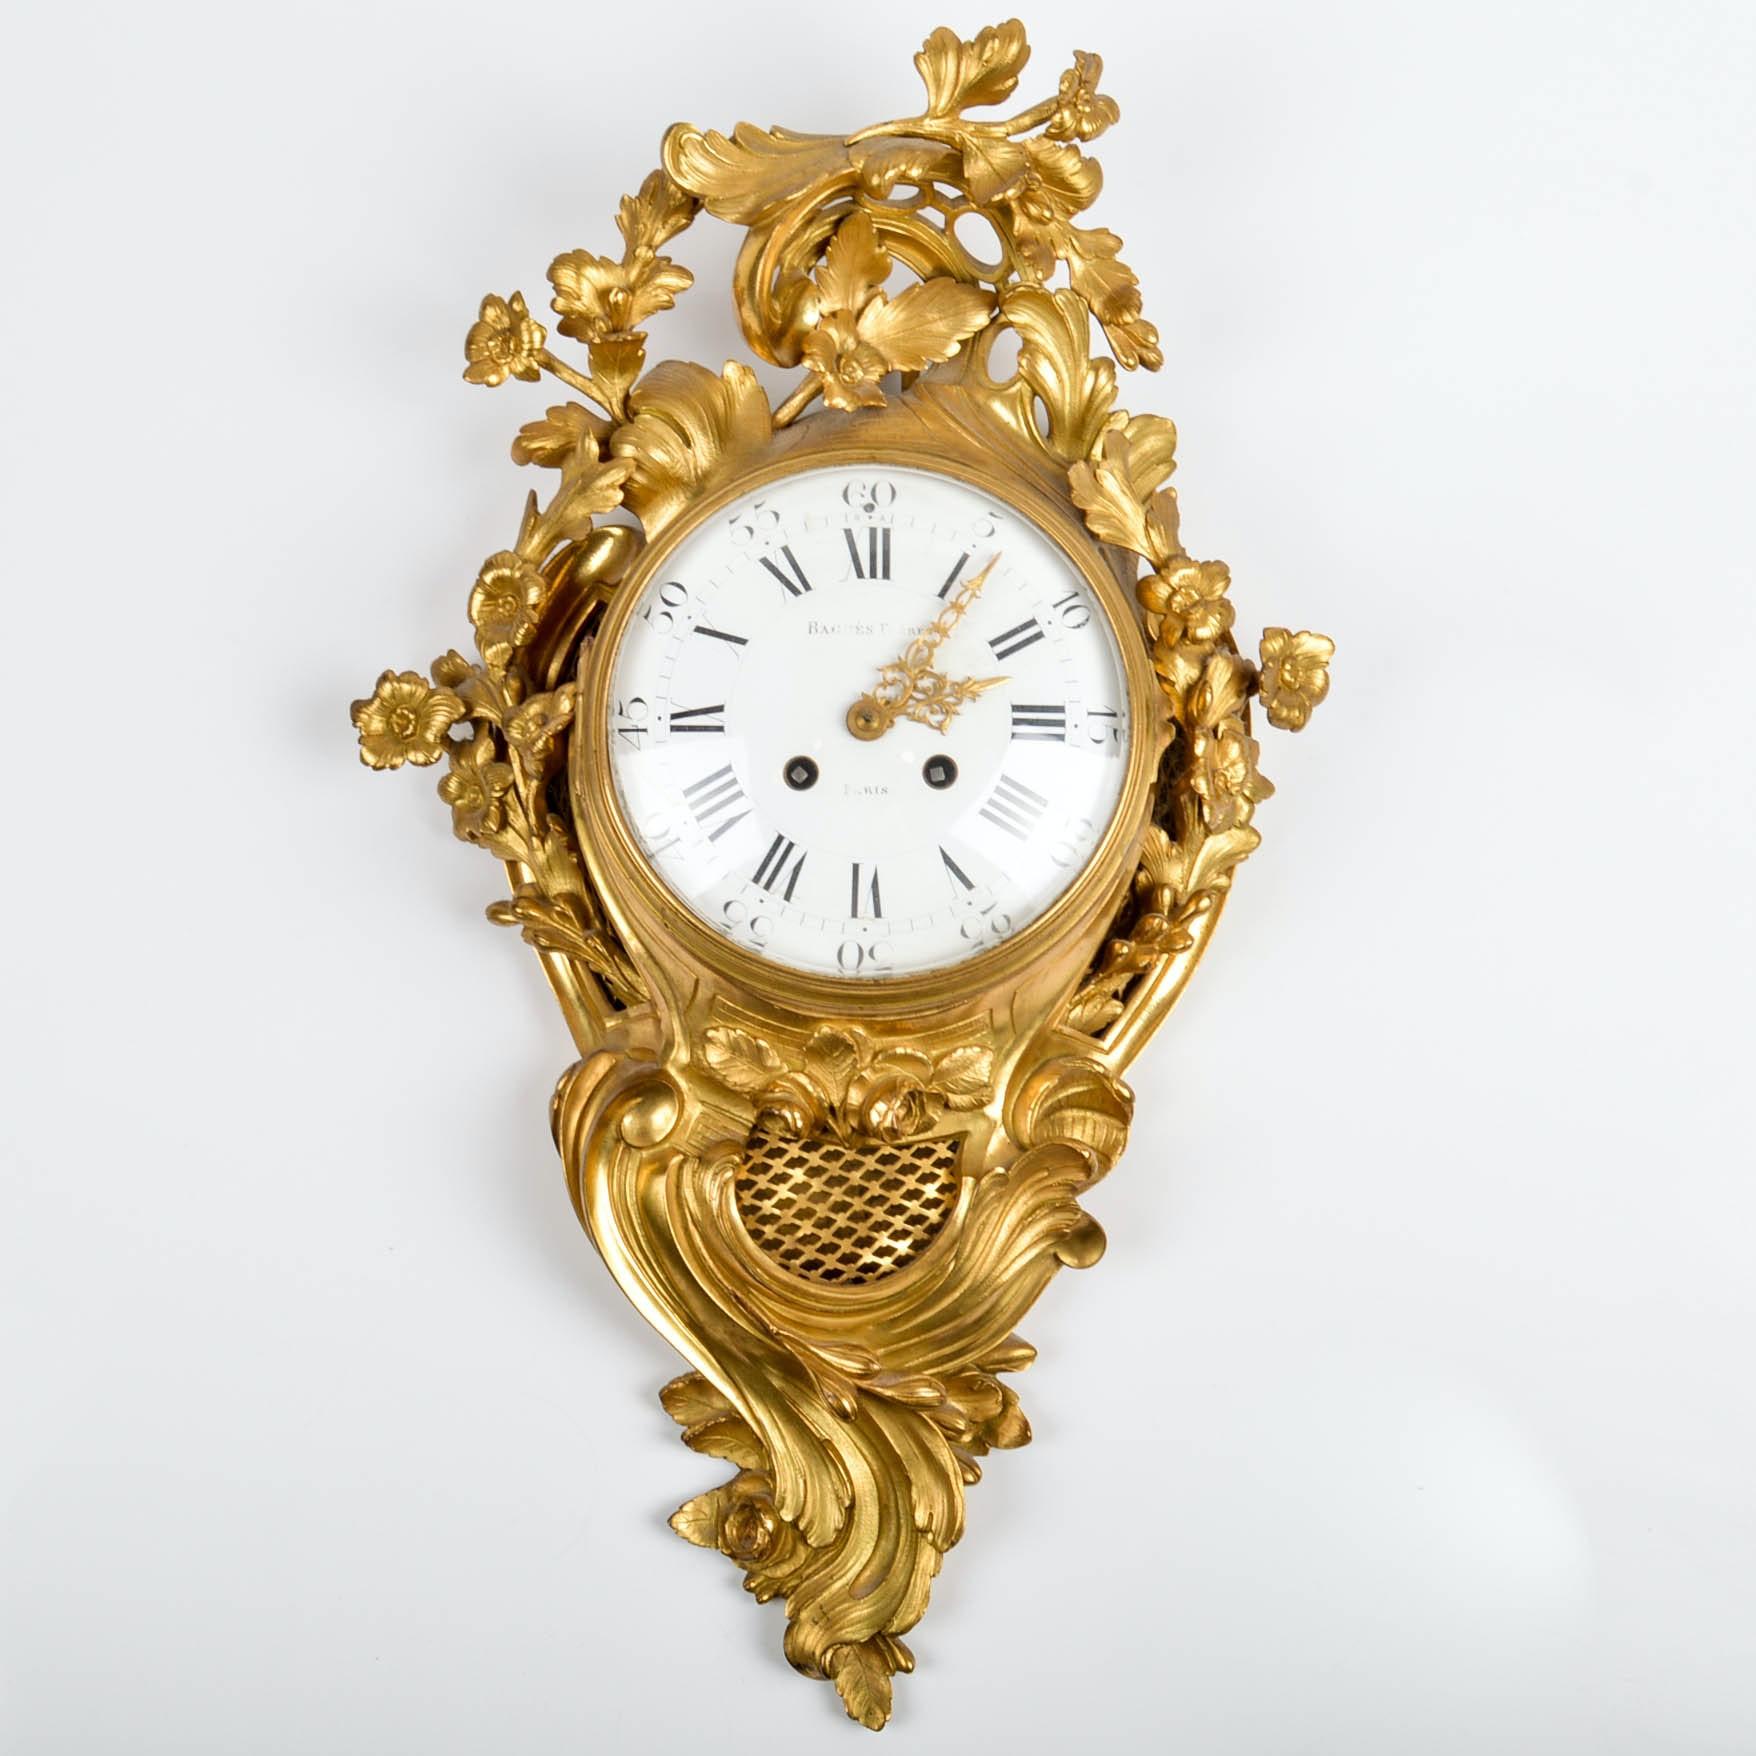 19th Century French Rococo Cartel Clock